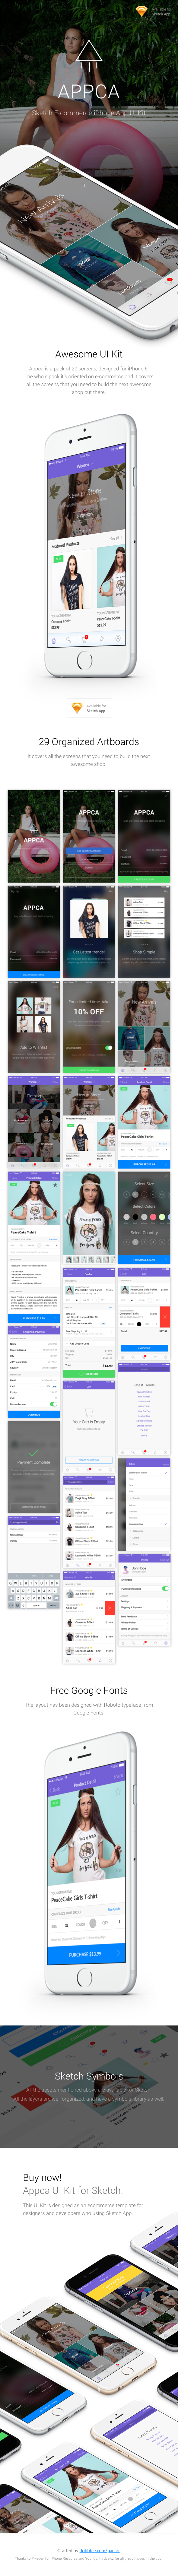 Appca - Ecommerce UI Kit for Sketch App